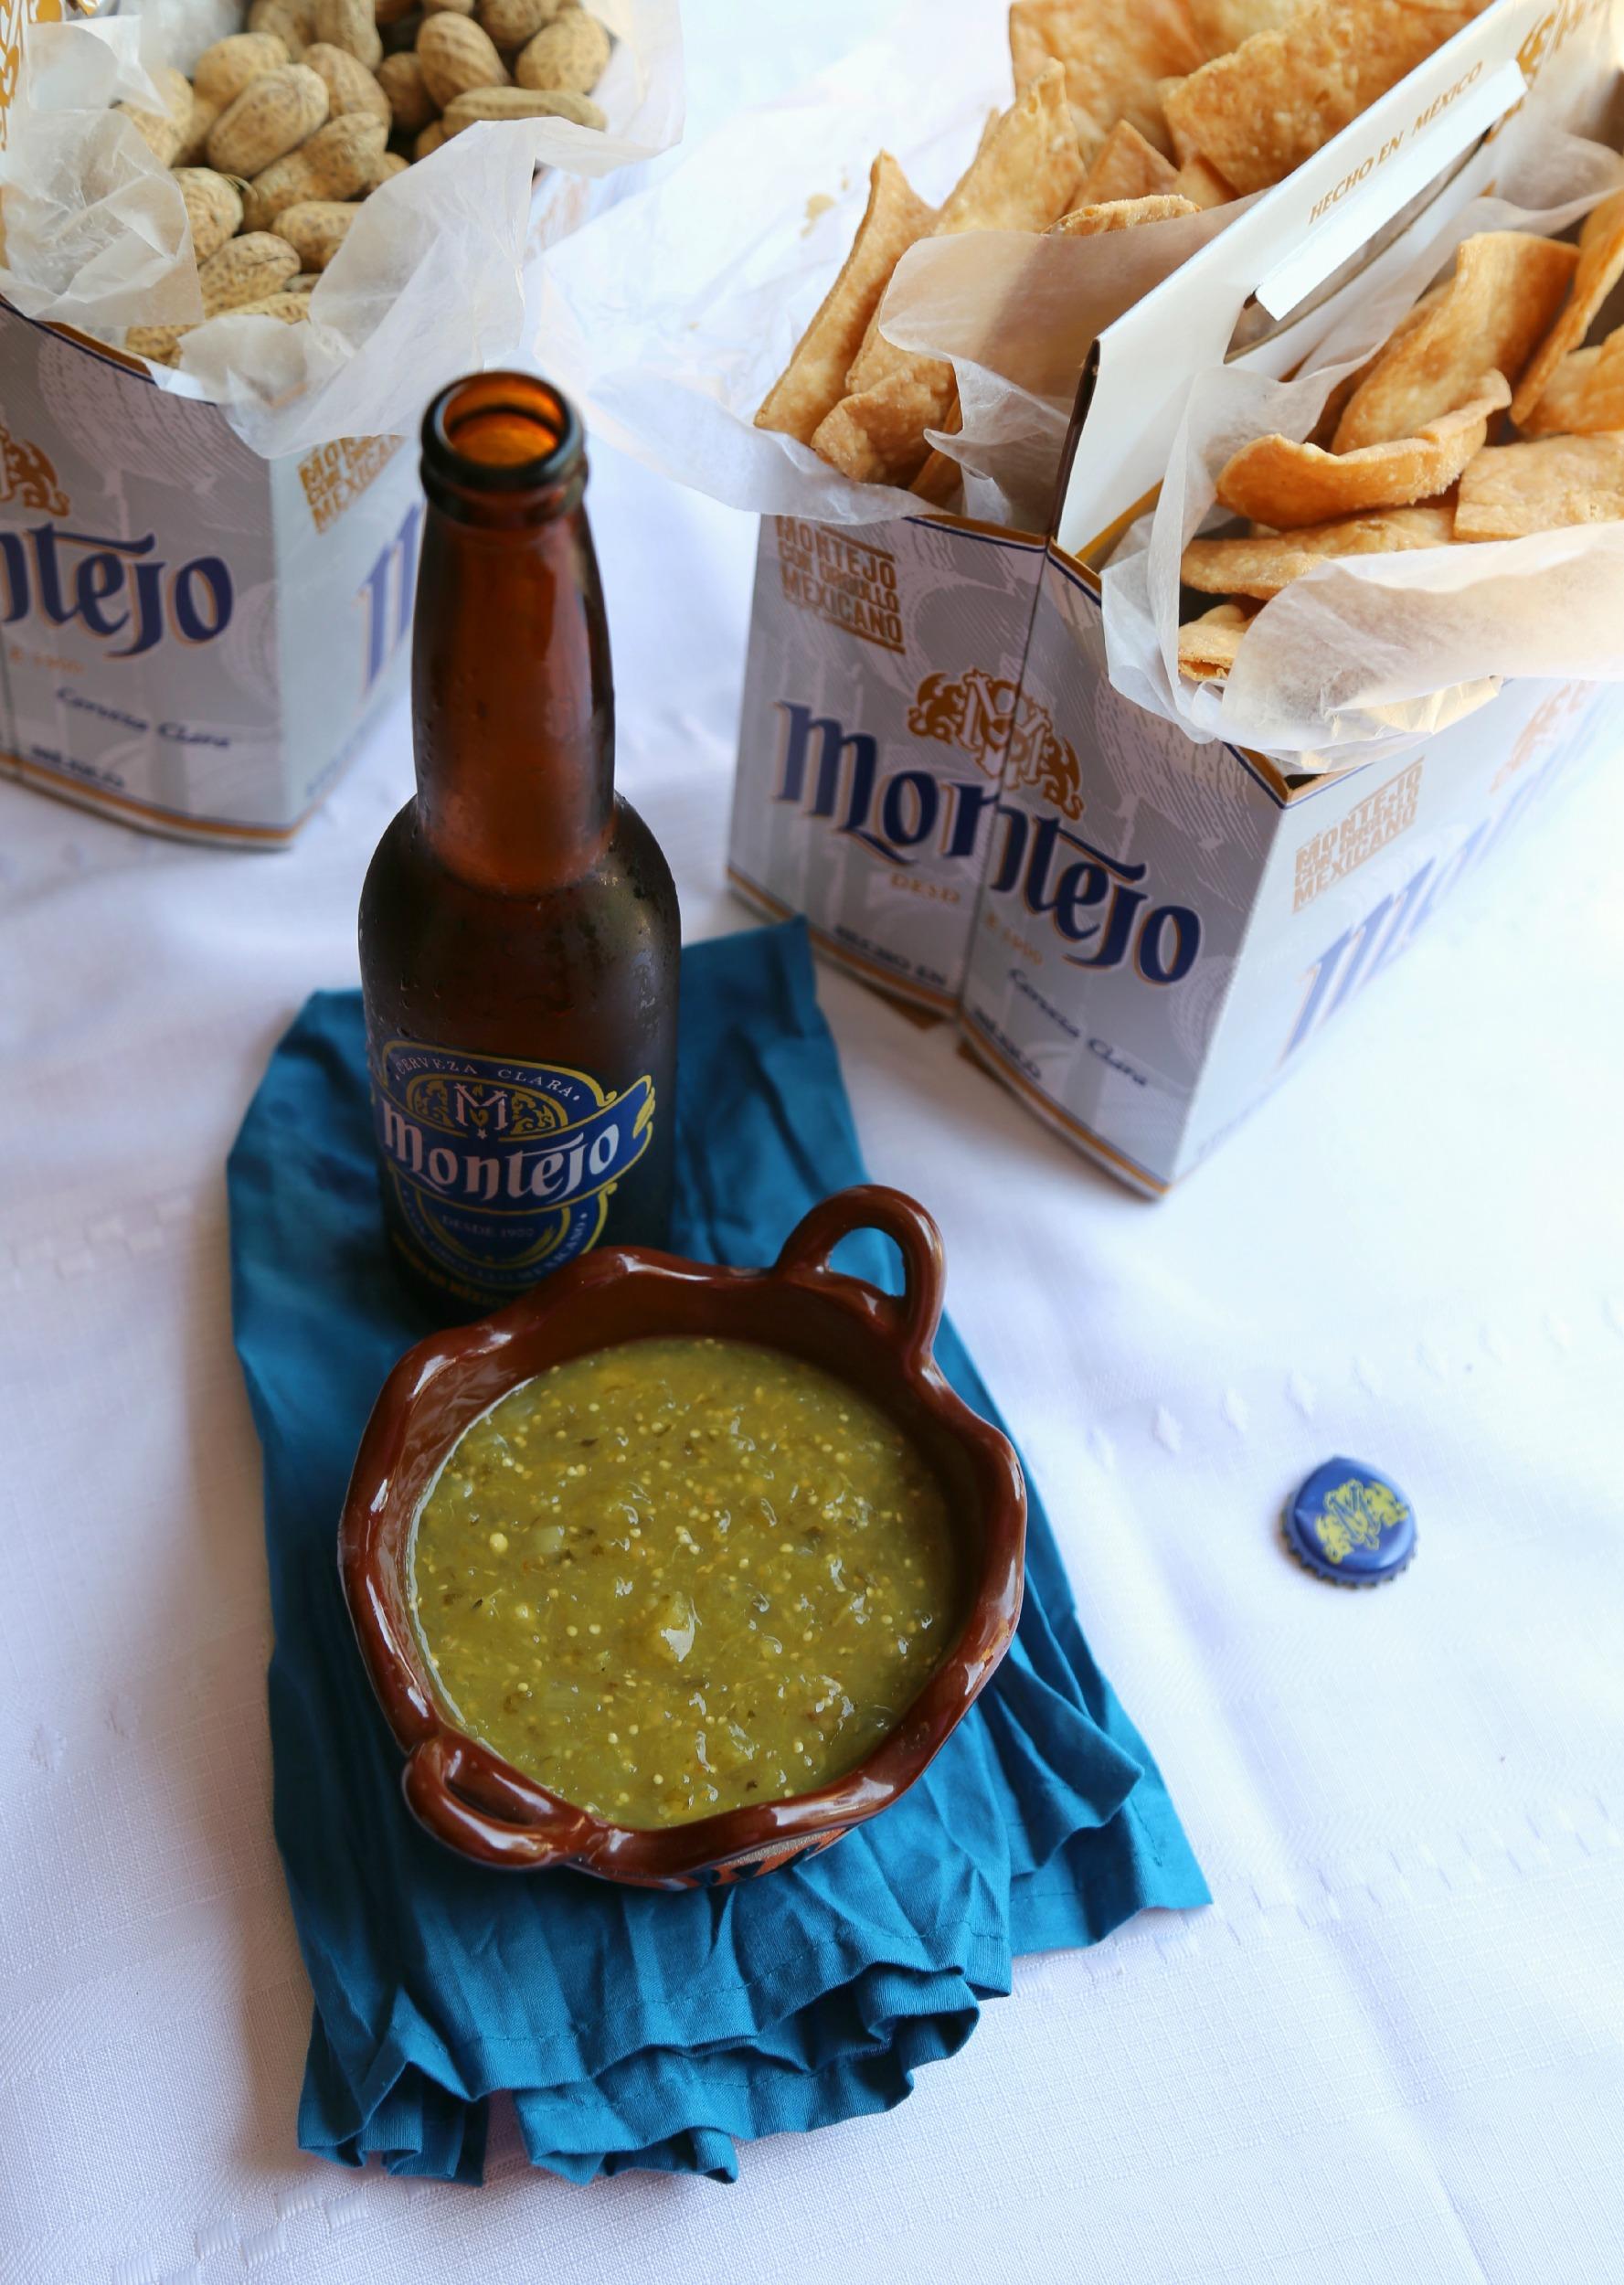 Montejo-cerveza-snck-caddies-VianneyRodriguez-sweetlifebake-beercocktail